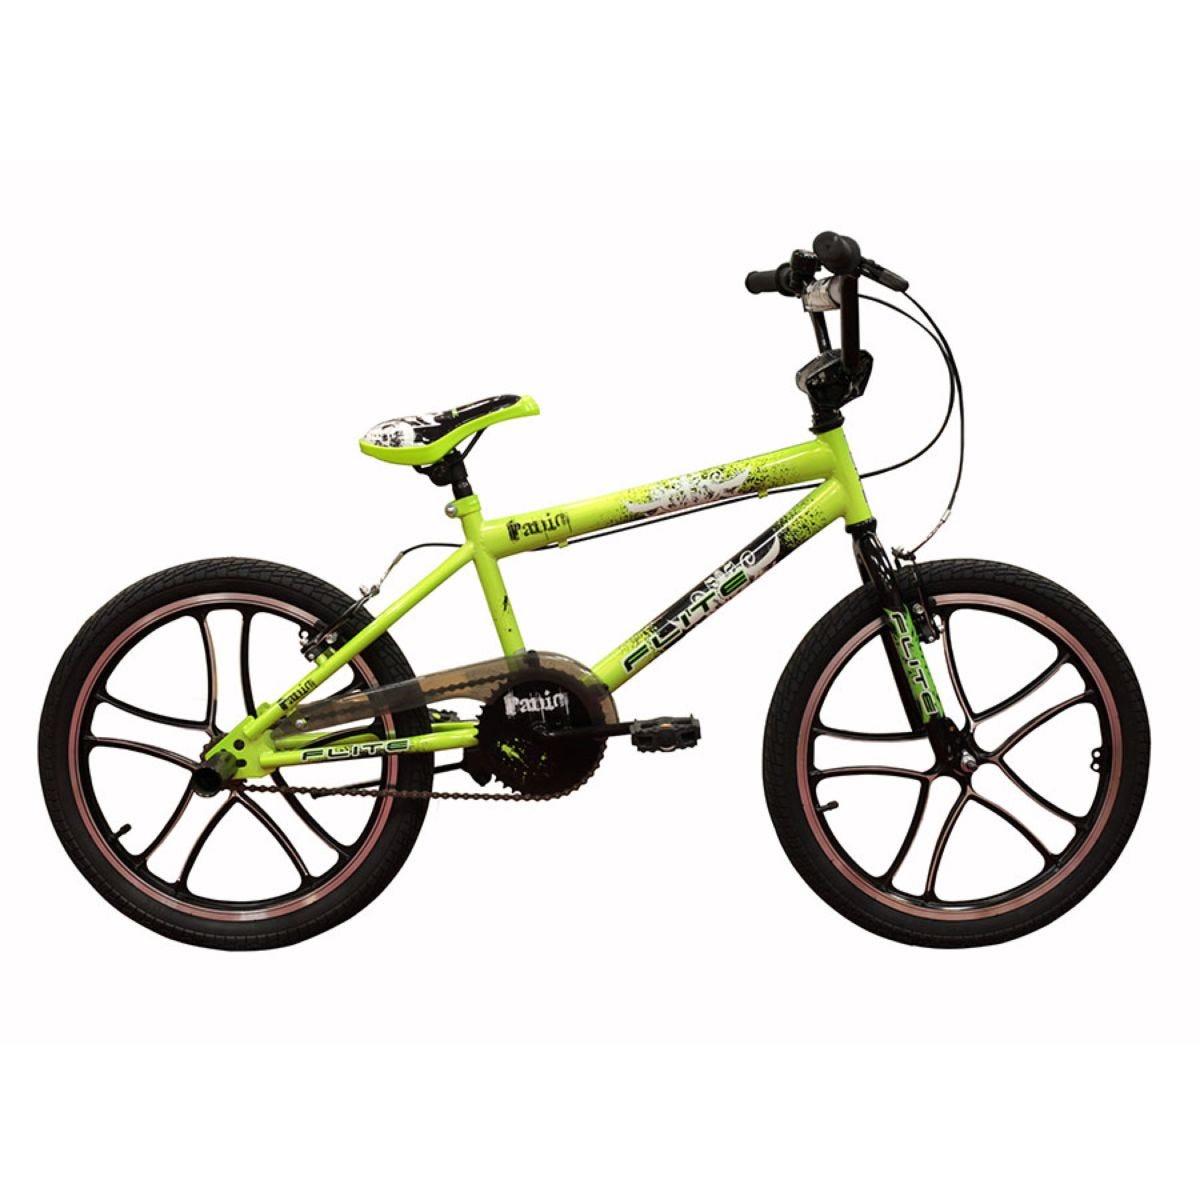 Flite 11-Inch Panic Mag Boys BMX Bike - Green